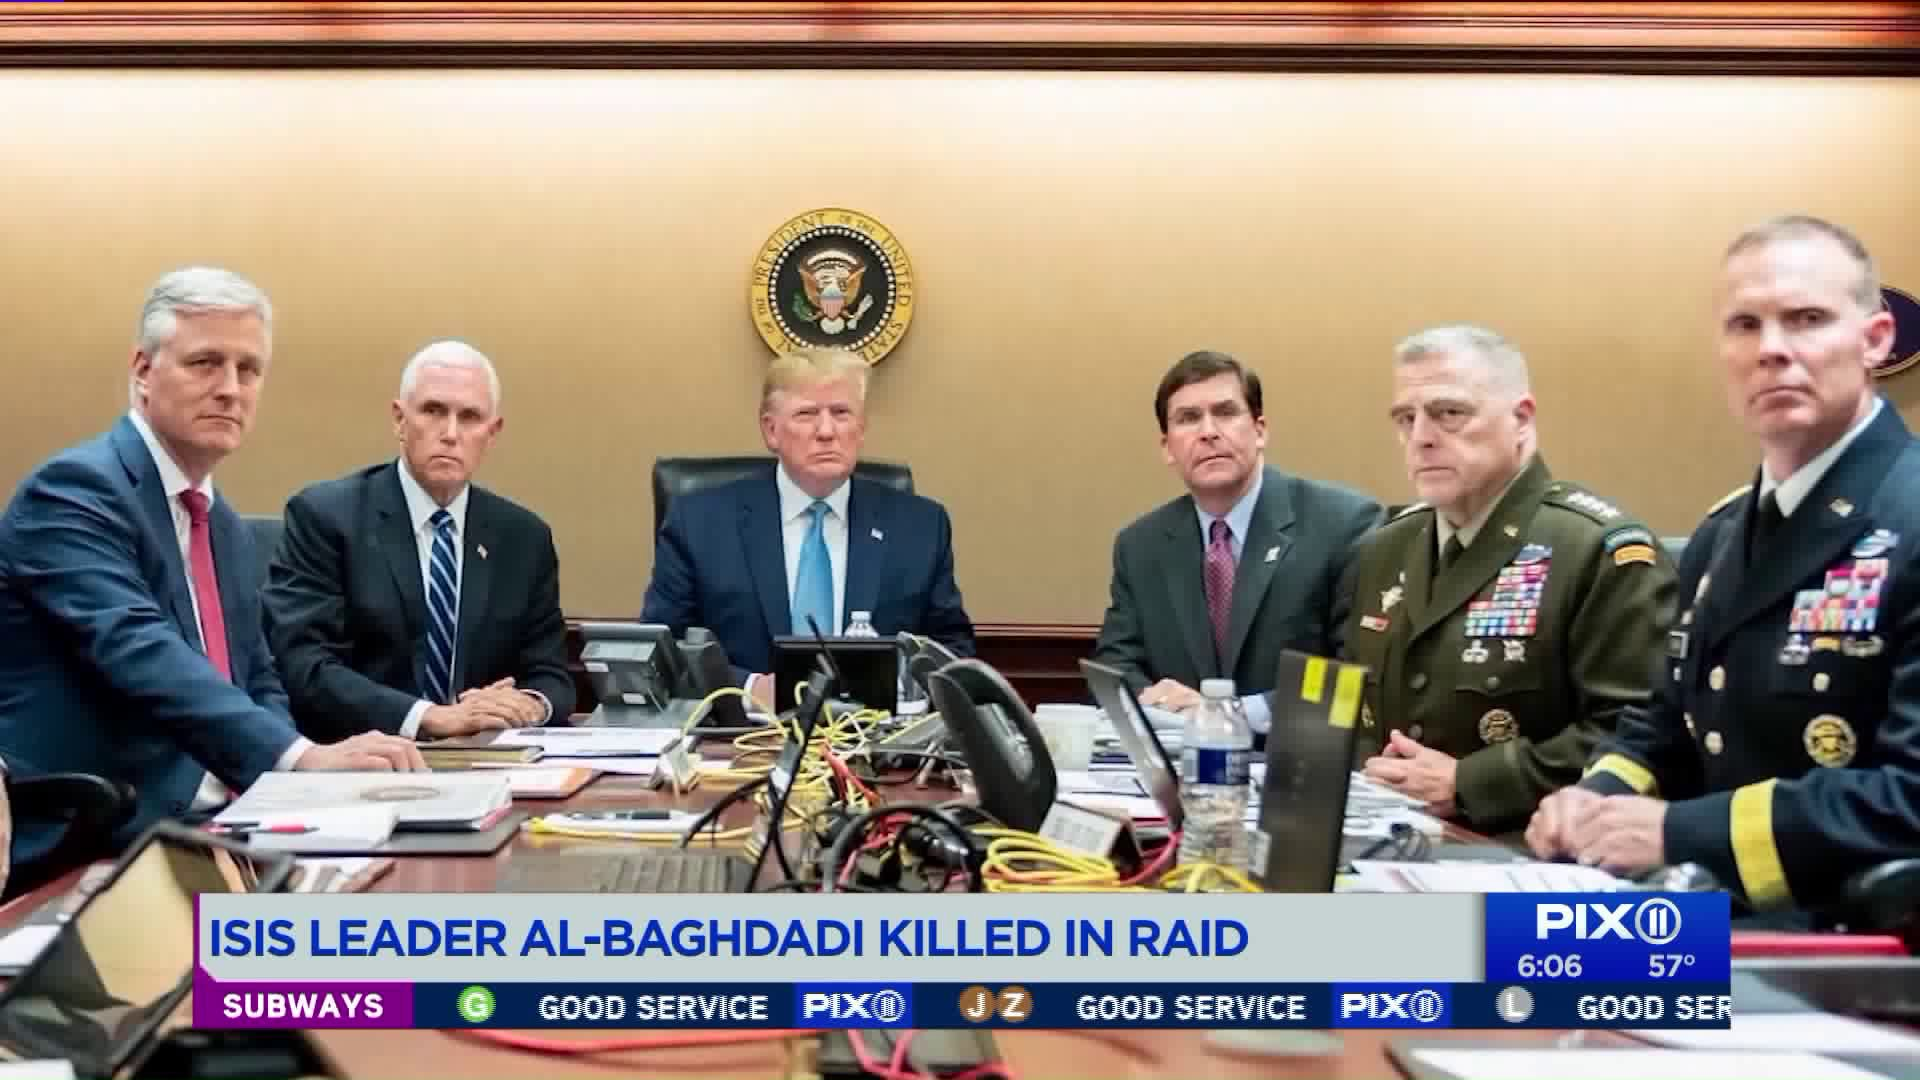 Trump Confirms ISIS Leader al-Baghdadi Killed in US Raid